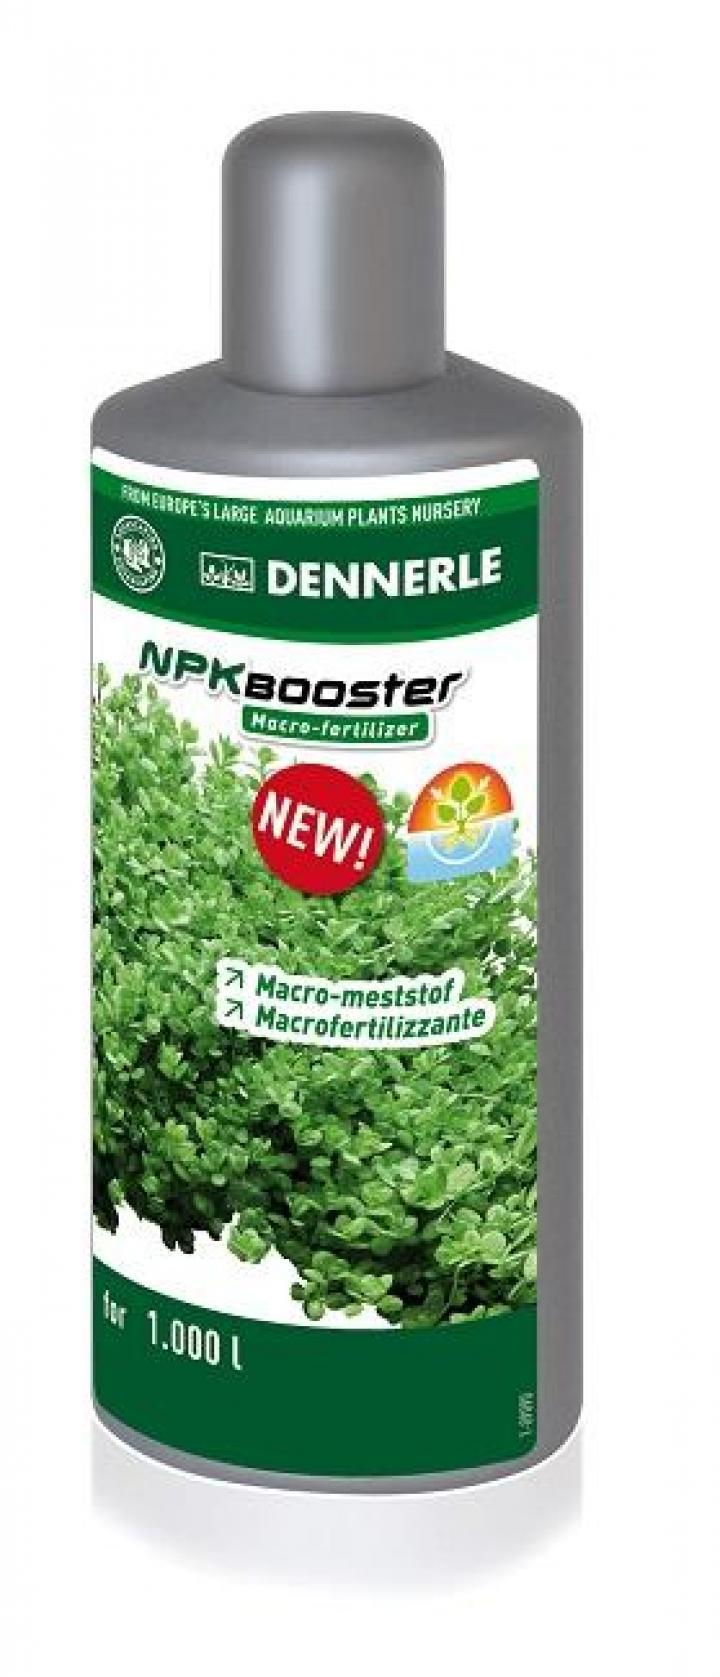 Dennerle - NPK Booster 250 ml